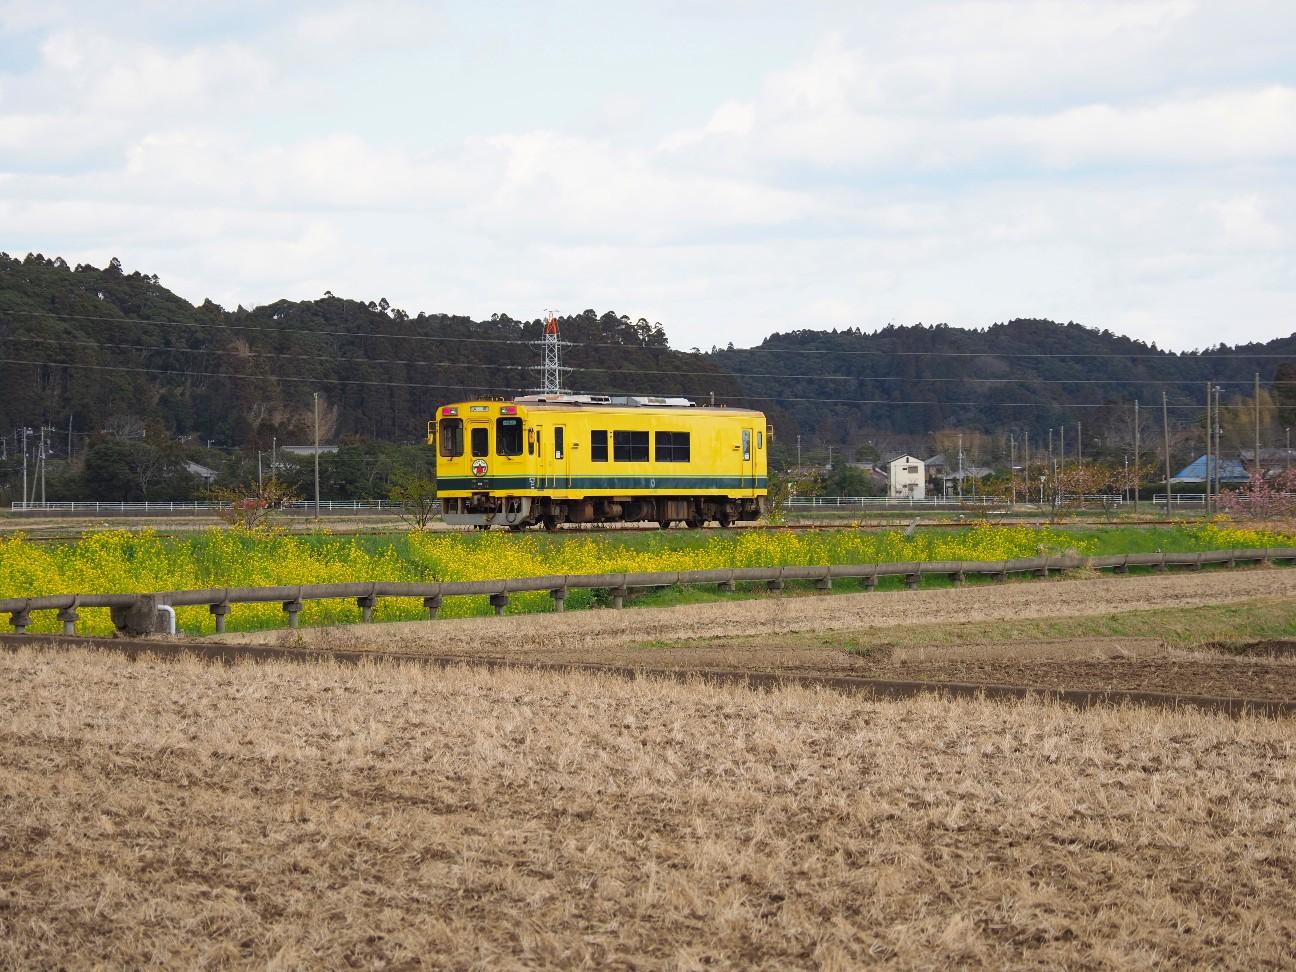 f:id:moriken-isumi:20200227134020j:image